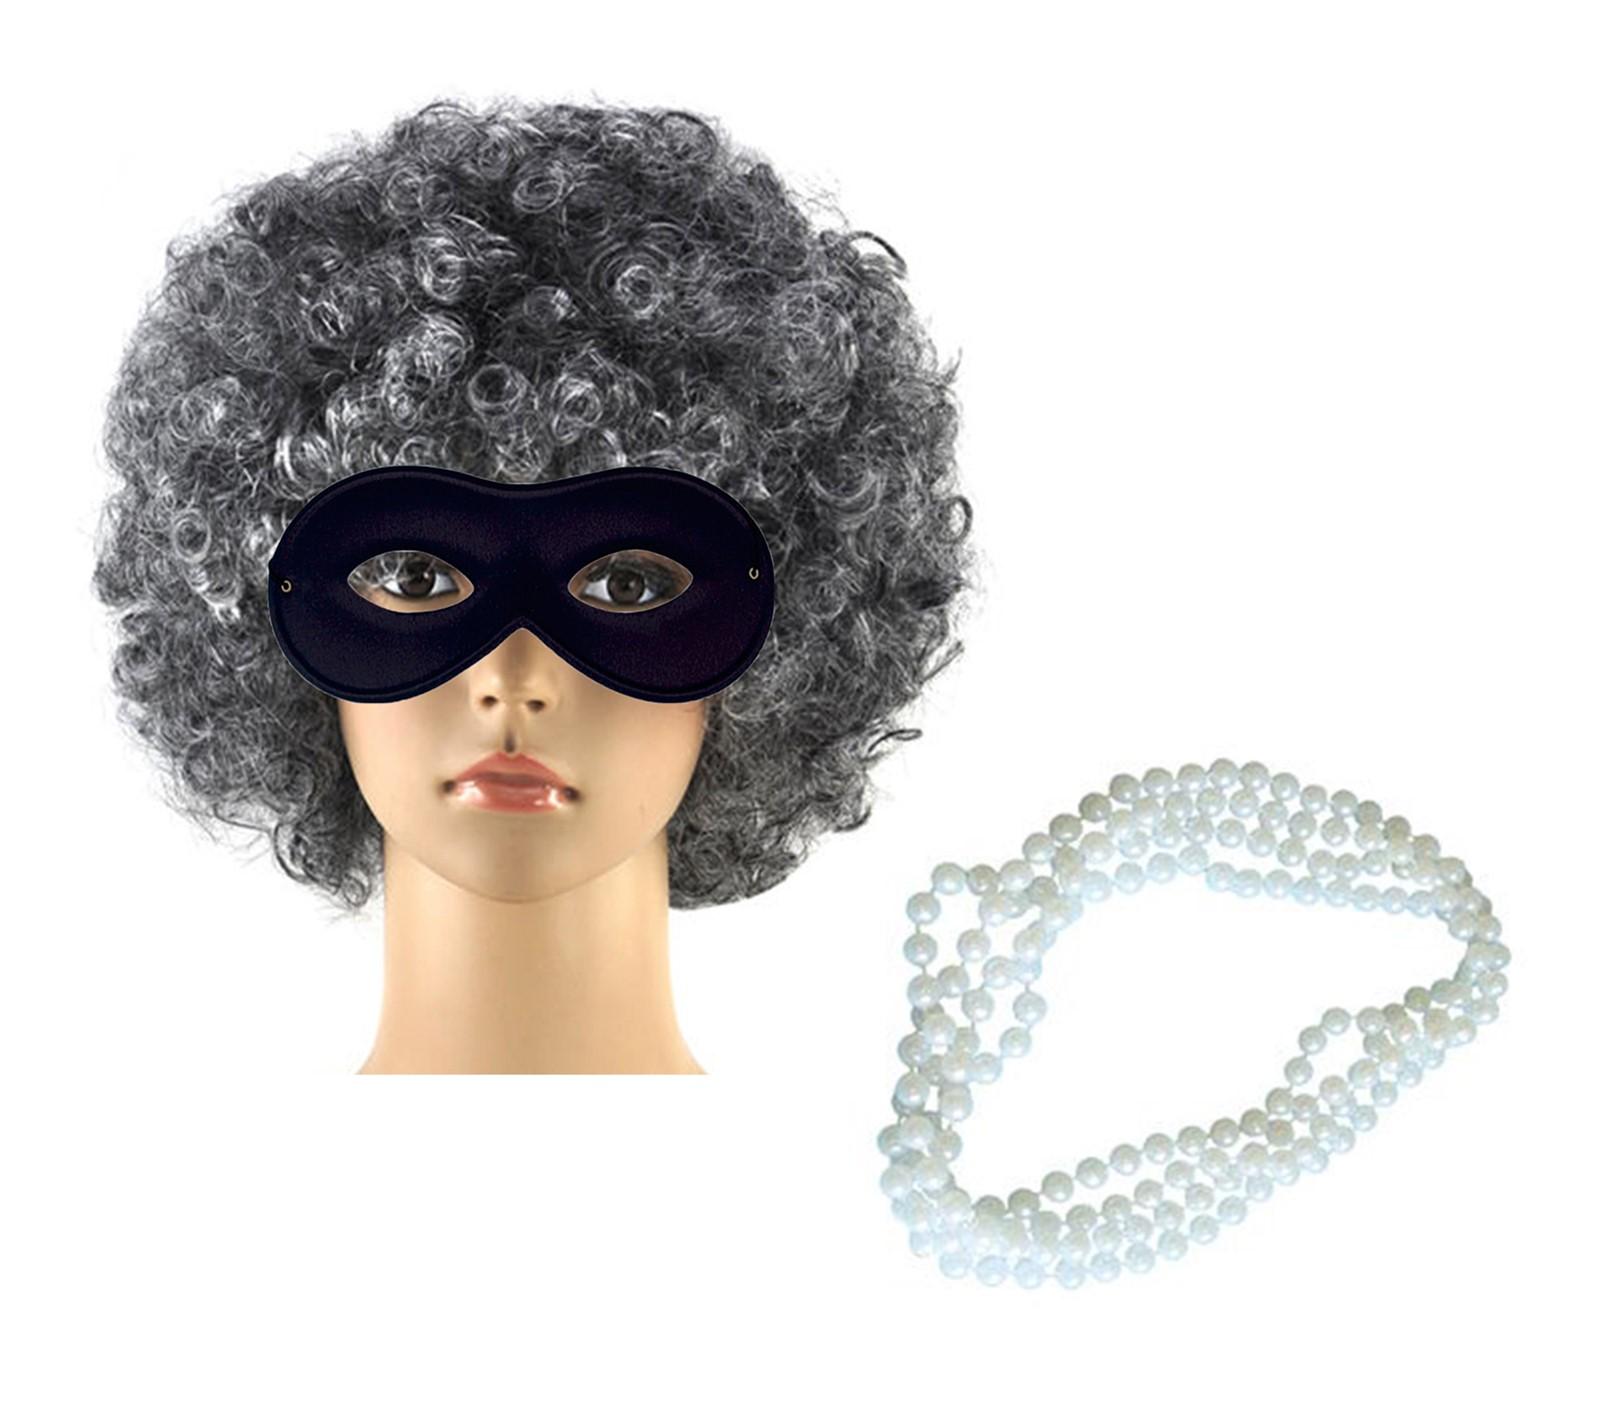 Womens Grey Wig Black Eye Mask Necklace Gangsta Granny Fancy Dress Accessory Set